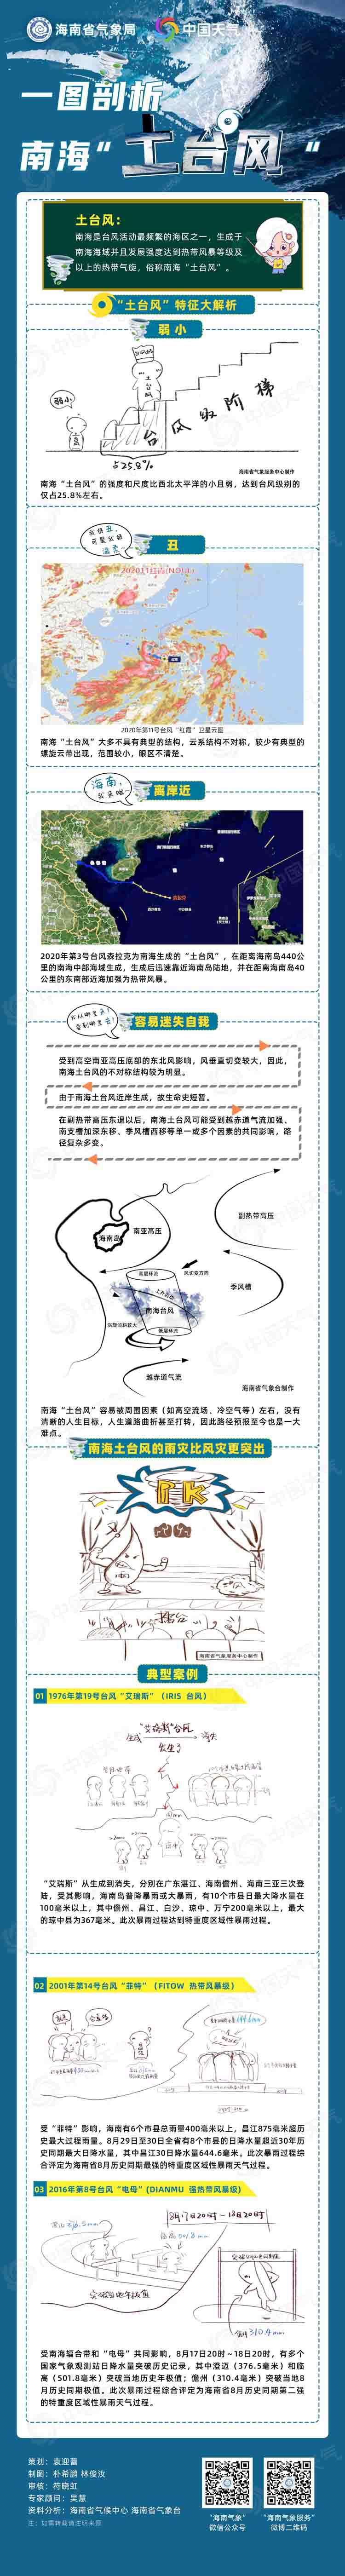 http://i.weather.com.cn/images/hainan/newzt/zt2019new/2021/04/29/1619663561679021443.jpg